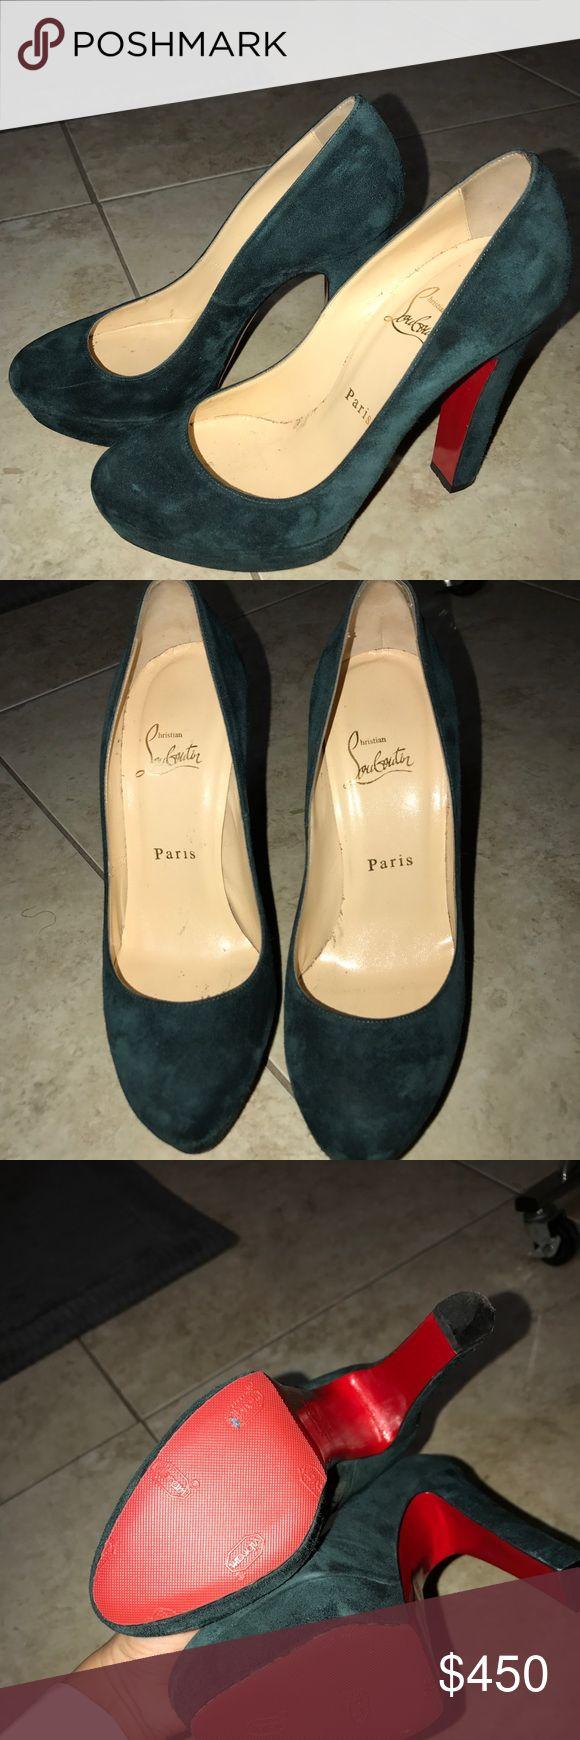 do christian louboutin shoes run small or big